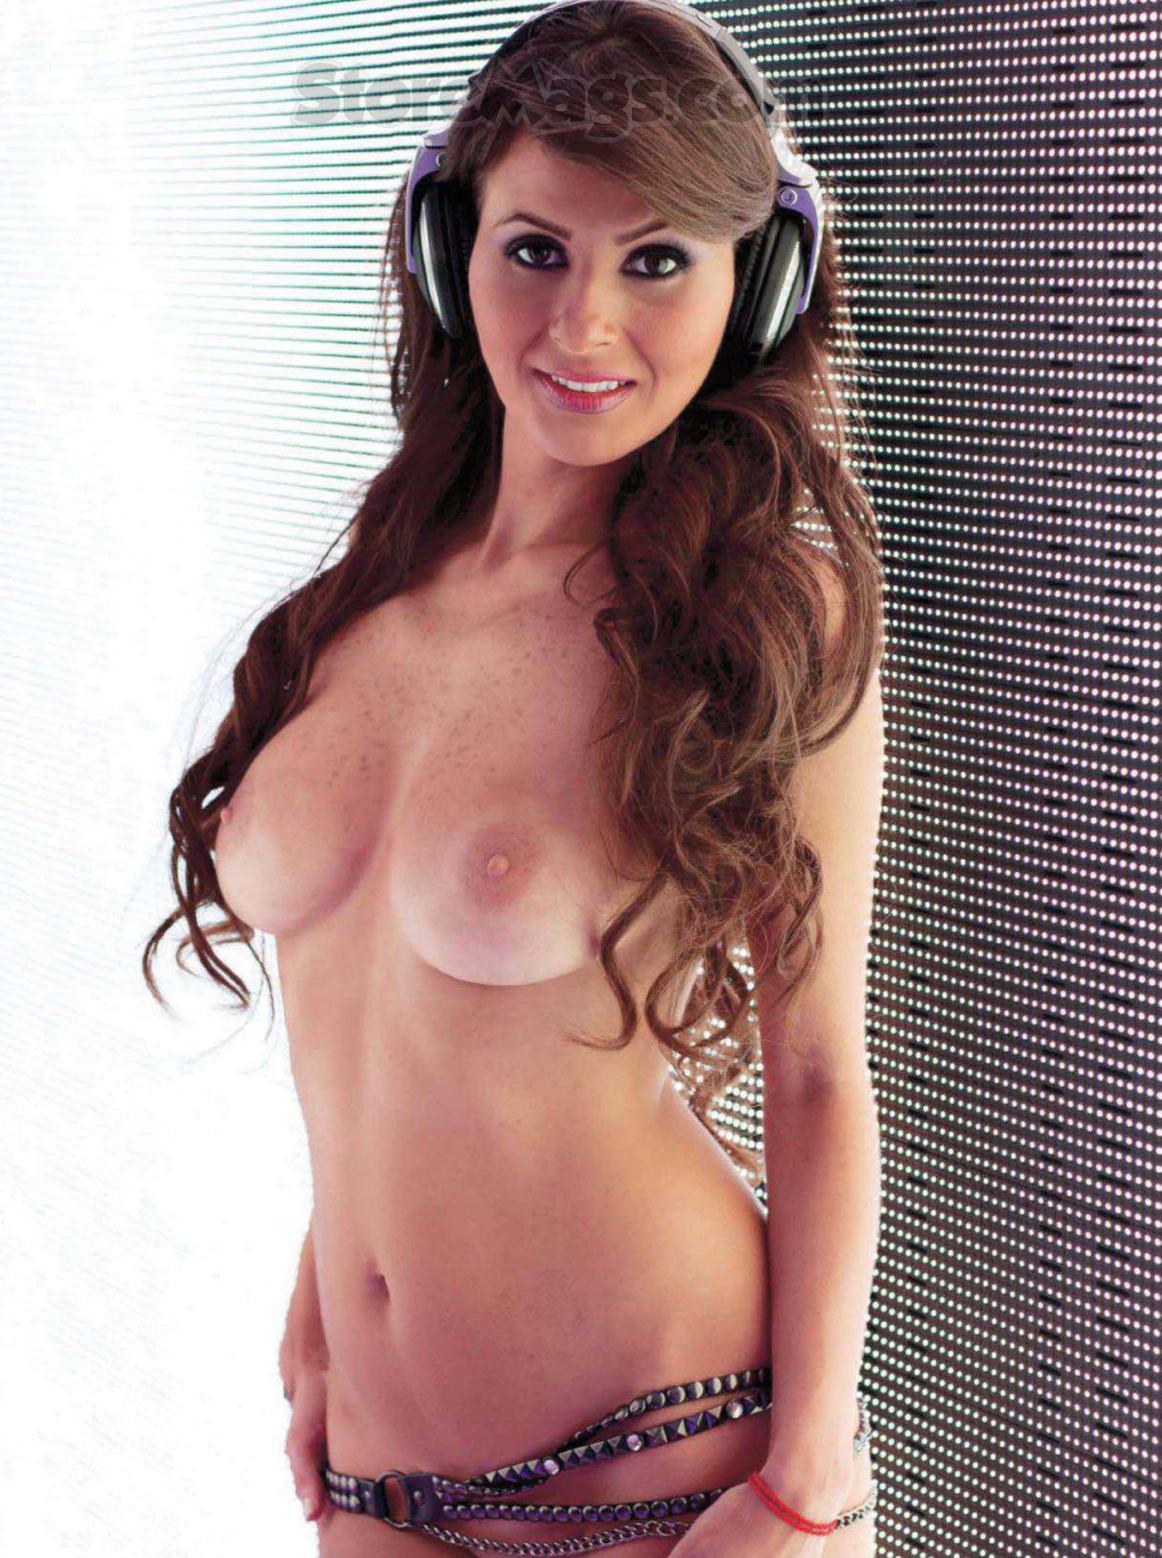 36672_septimiu29_DJAgniezka_PlayboyVenezuela_Sept20125_123_375lo.jpg